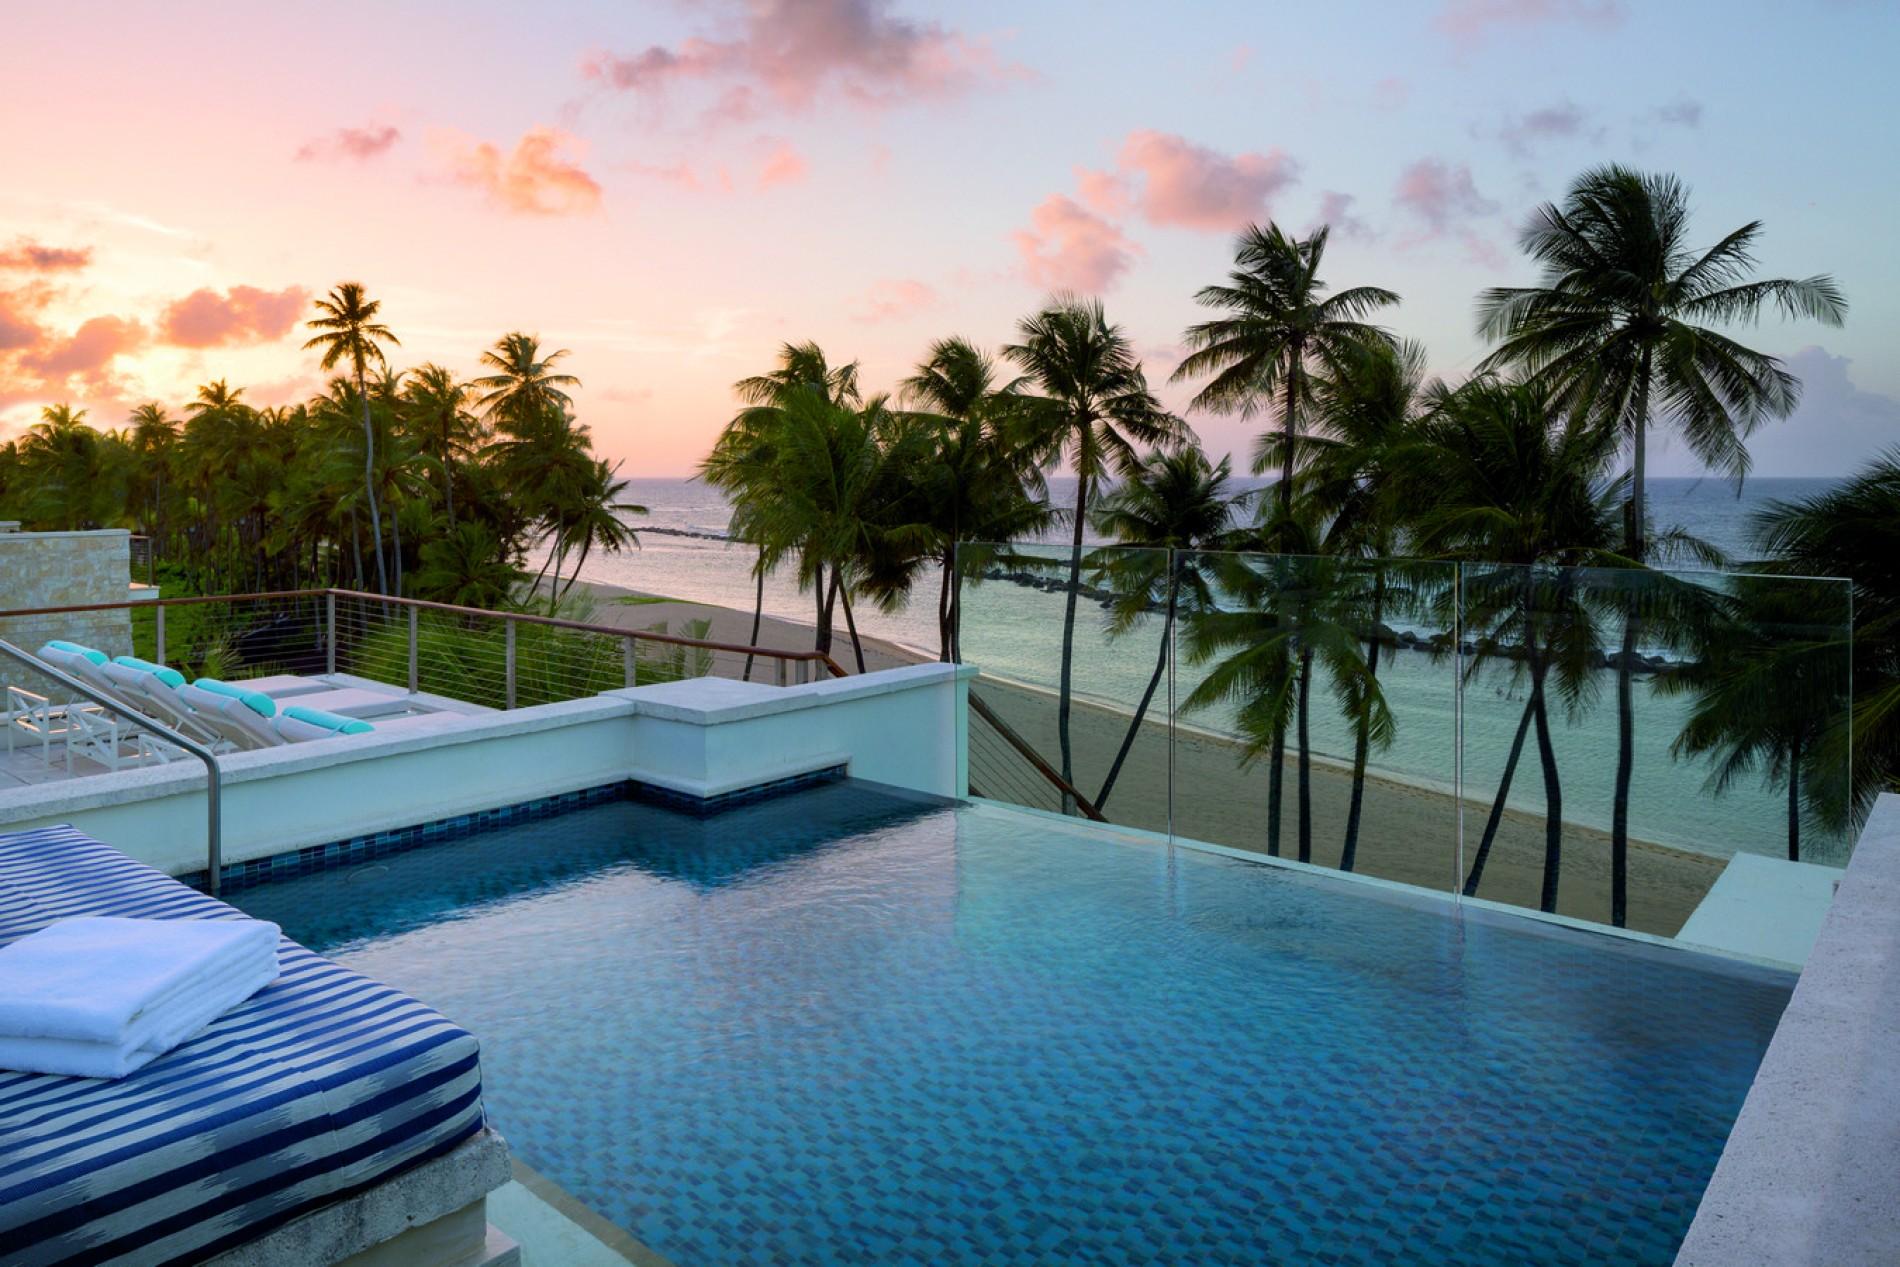 Plantation Hotel Dorado Beach Puerto Rico